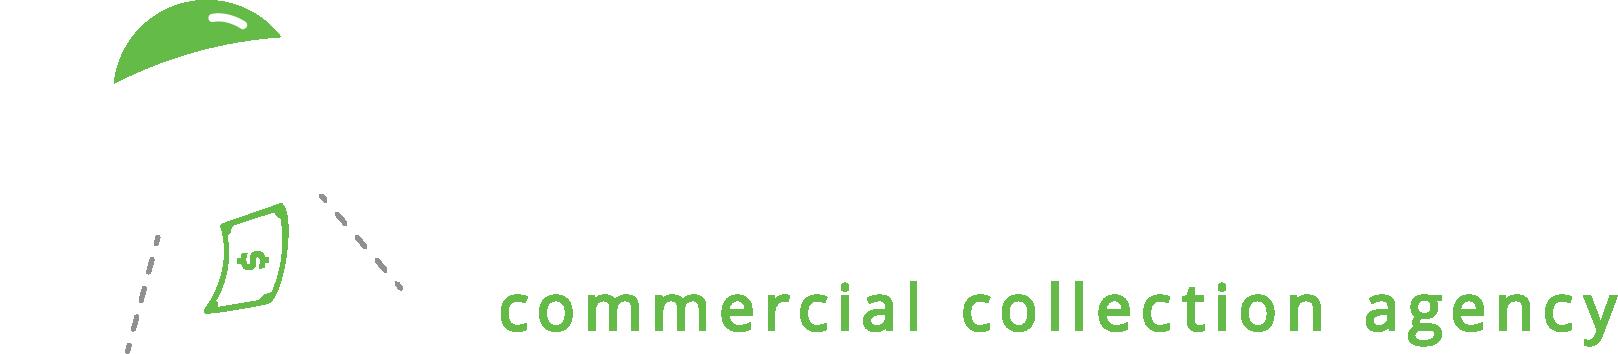 enterprise-recovery_logo_header.png